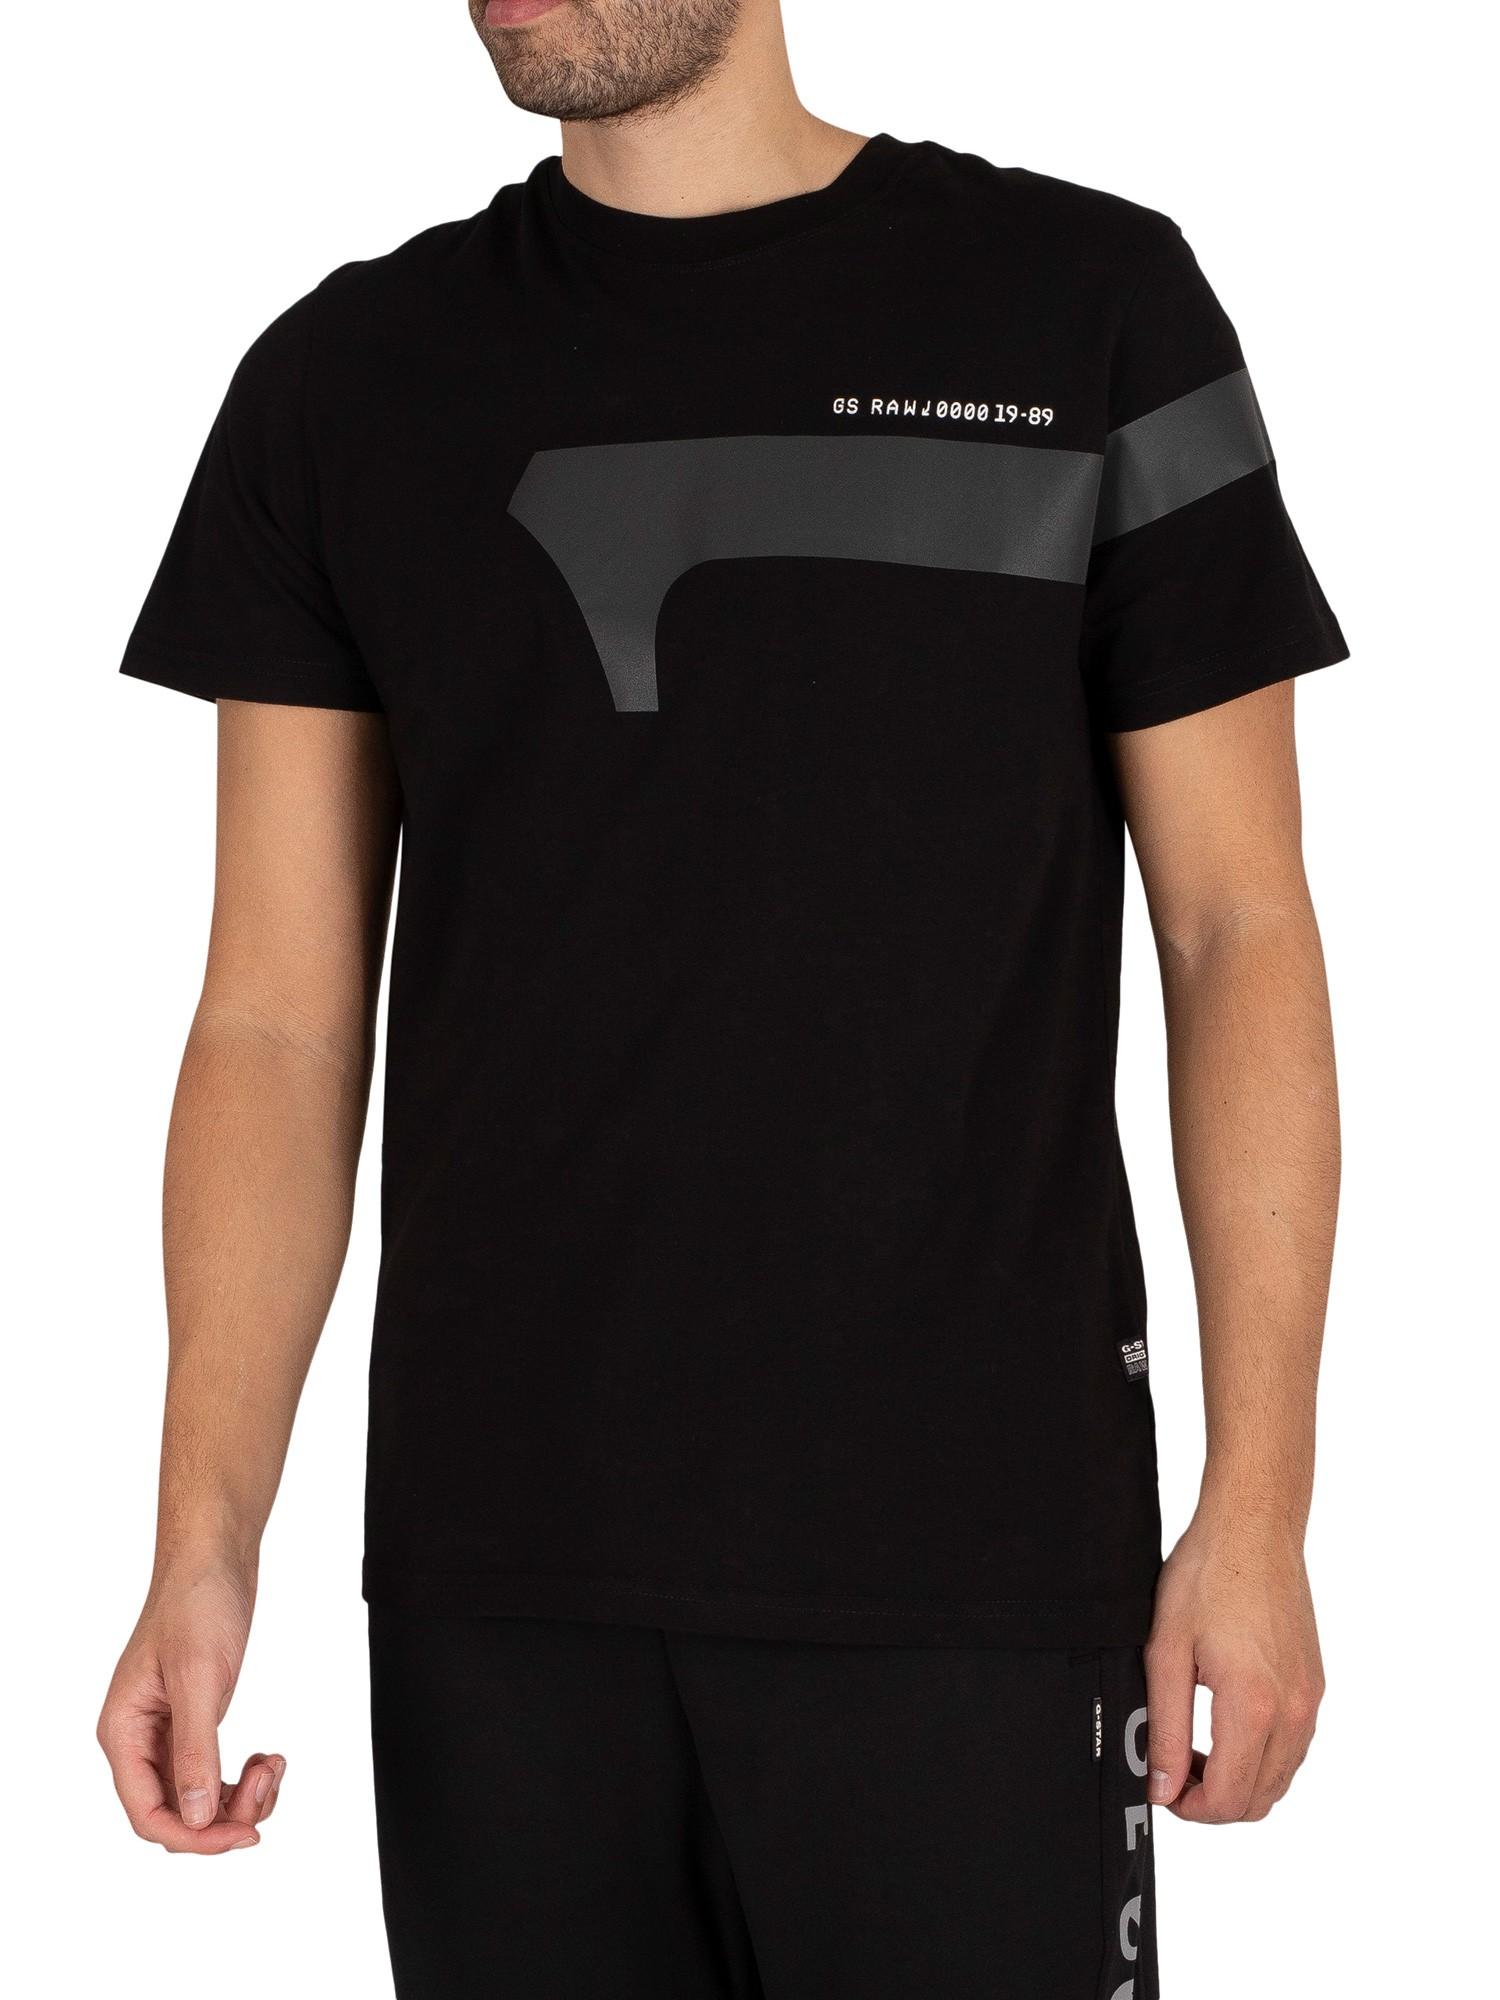 Reflective-Graphic-TShirt